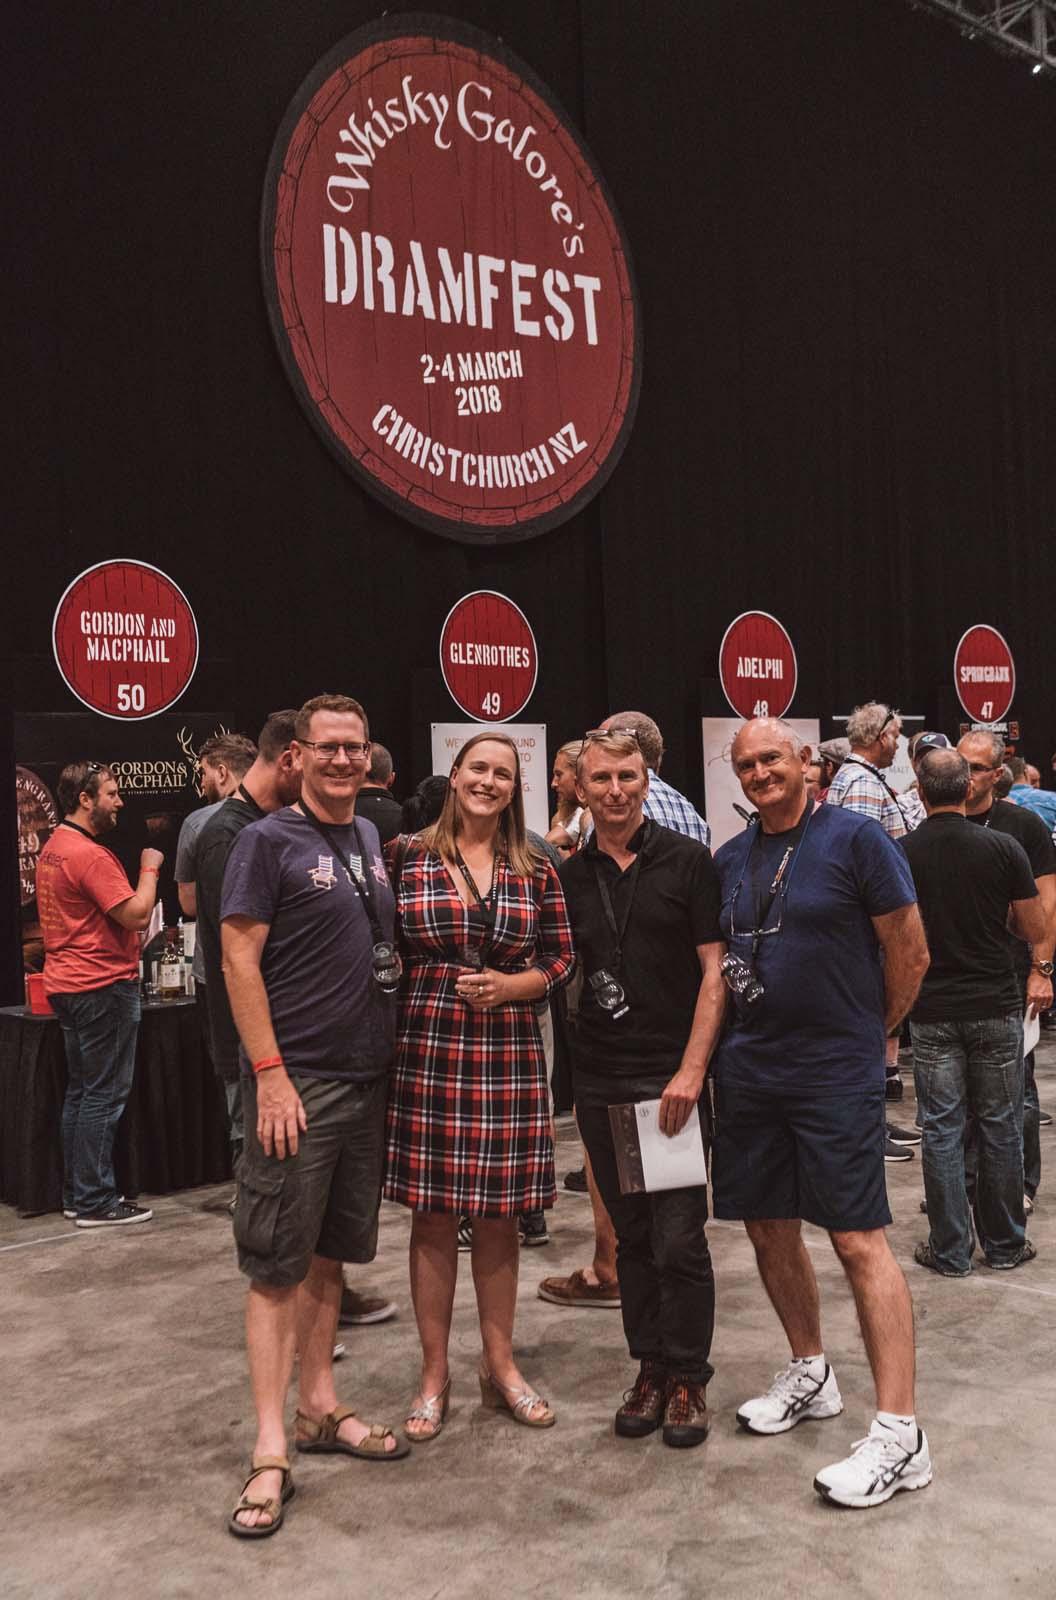 Dramfest 2018 for Whisky Galore-352.jpg